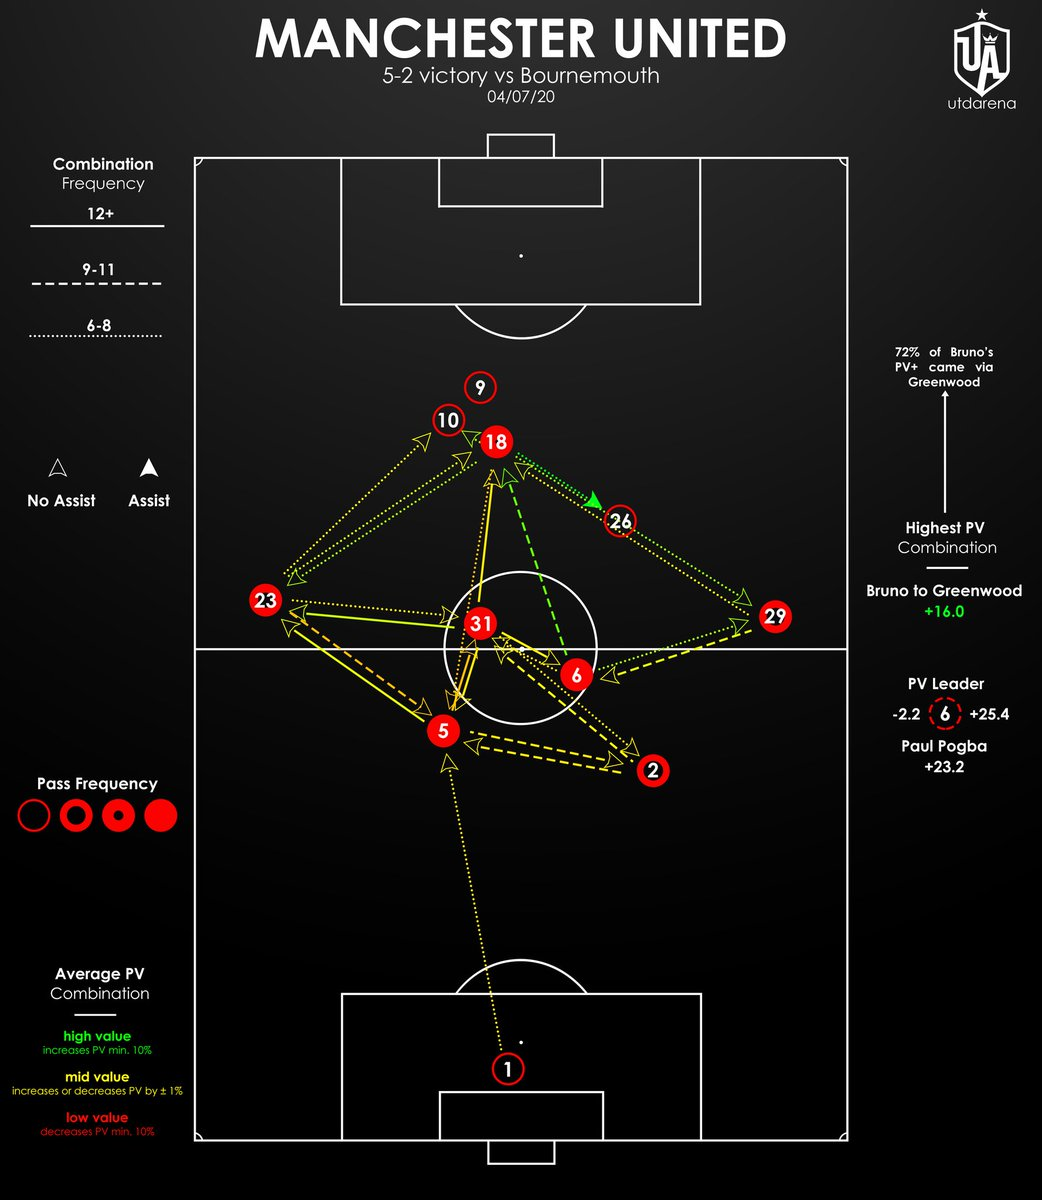 Manchester United 5-2 Bournemouth:  🖊️ Possession Value (PV) Pass Map 🖊️ Possession Value (PV) Map 🖊️ Aaron Wan-Bissaka Receptions https://t.co/RFWQ7DOEkS